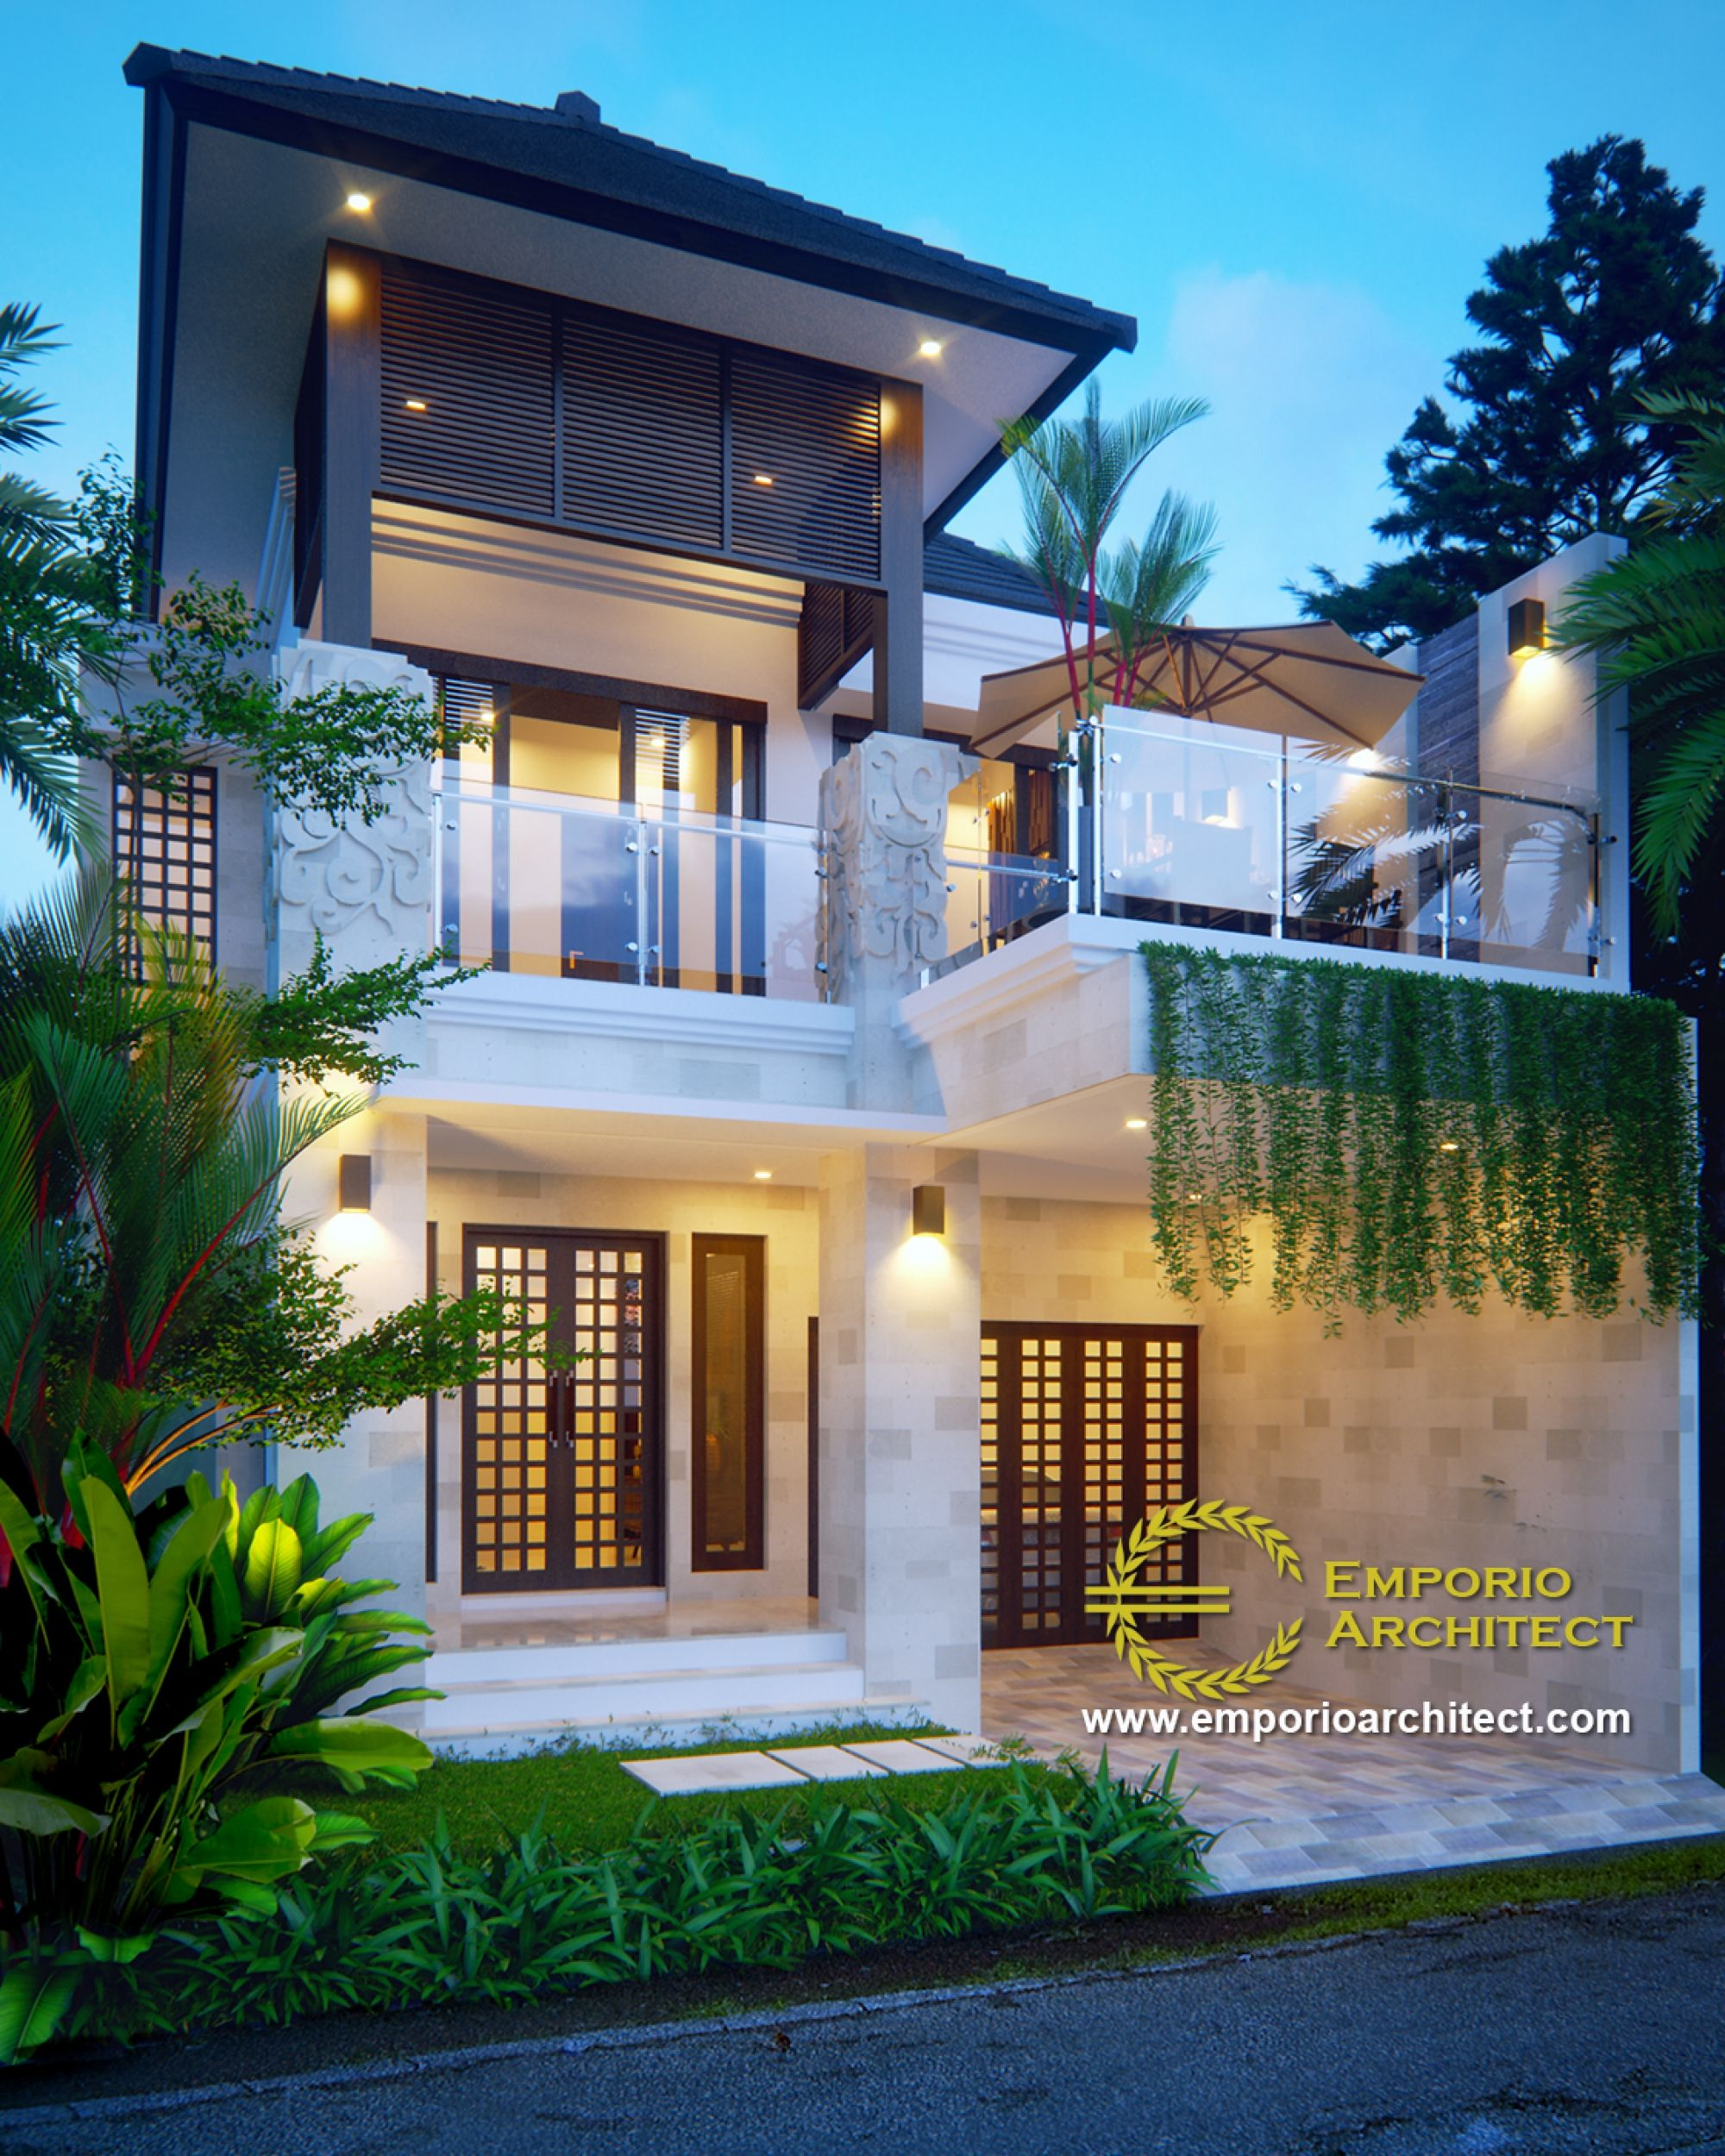 Jasa Arsitek Desain Rumah Bapak Michael Yogyakarta Jasa Arsitek